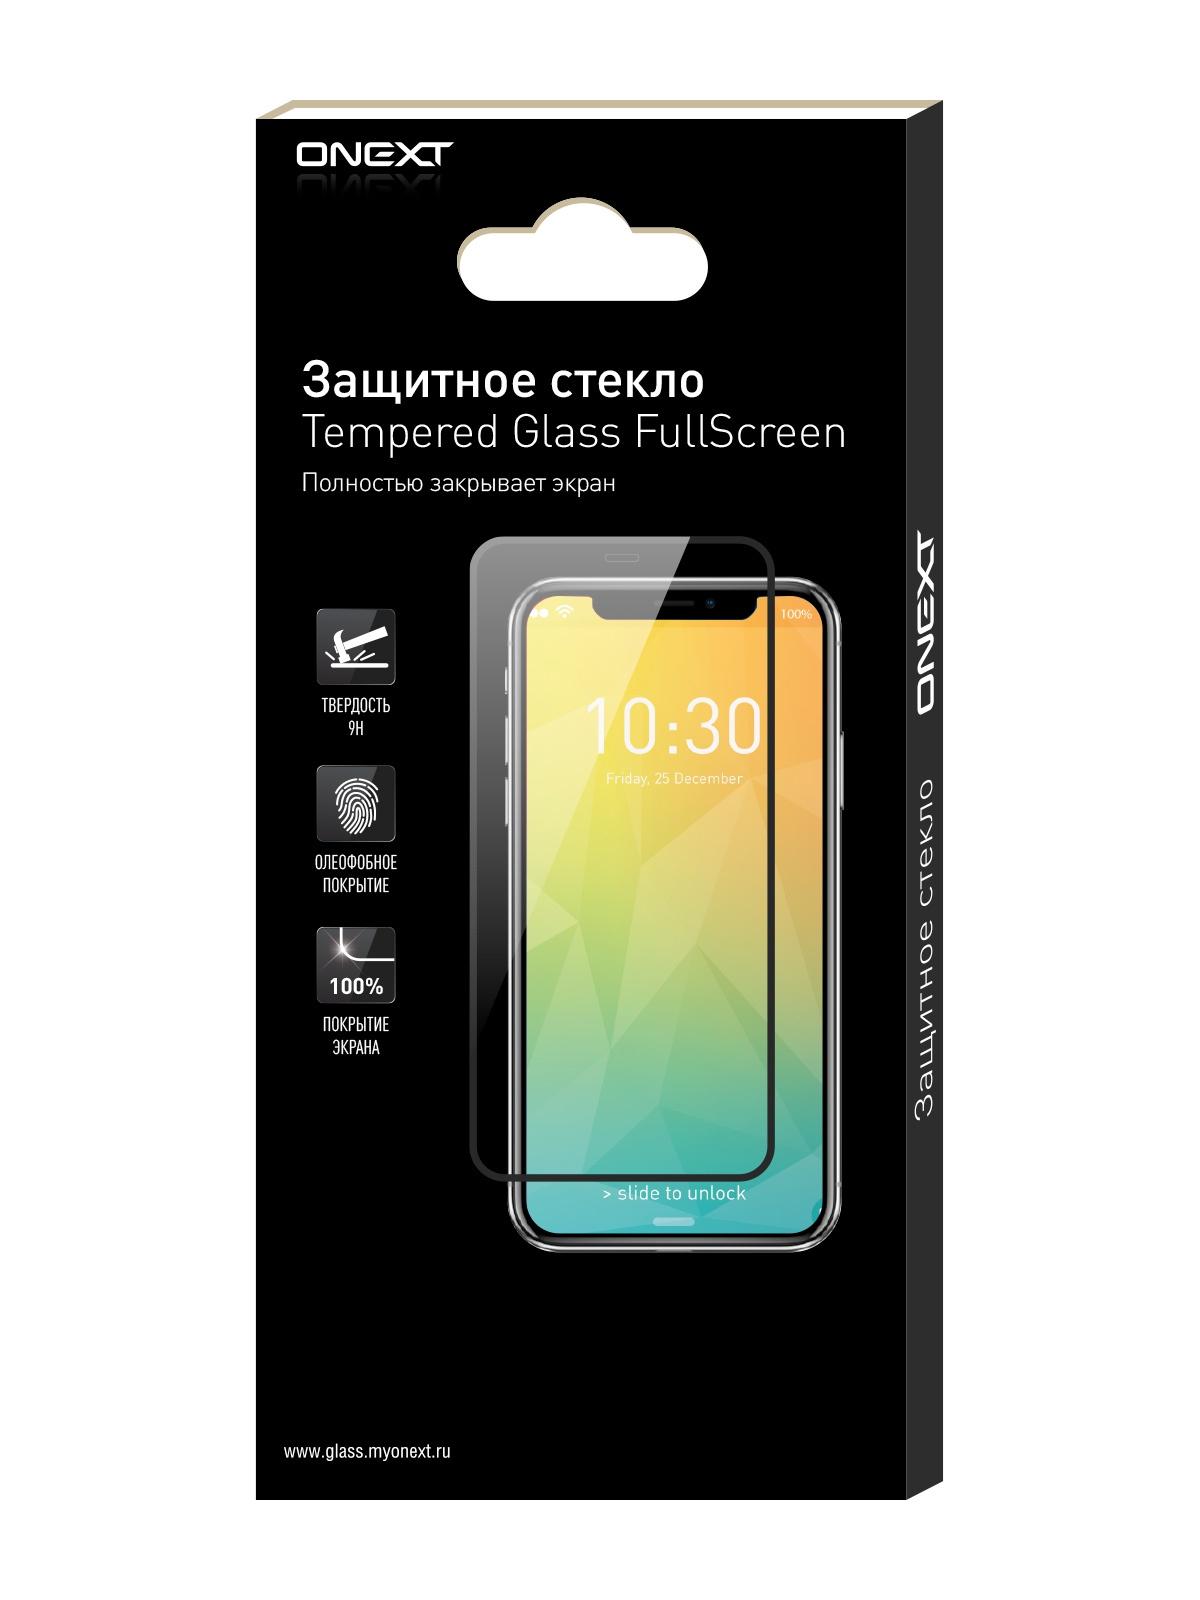 Защитное стекло ONEXT Xiaomi Mi 8 Pro, с рамкой (fulll glue, 2018) защитное стекло onext xiaomi mi 8 pro 2018